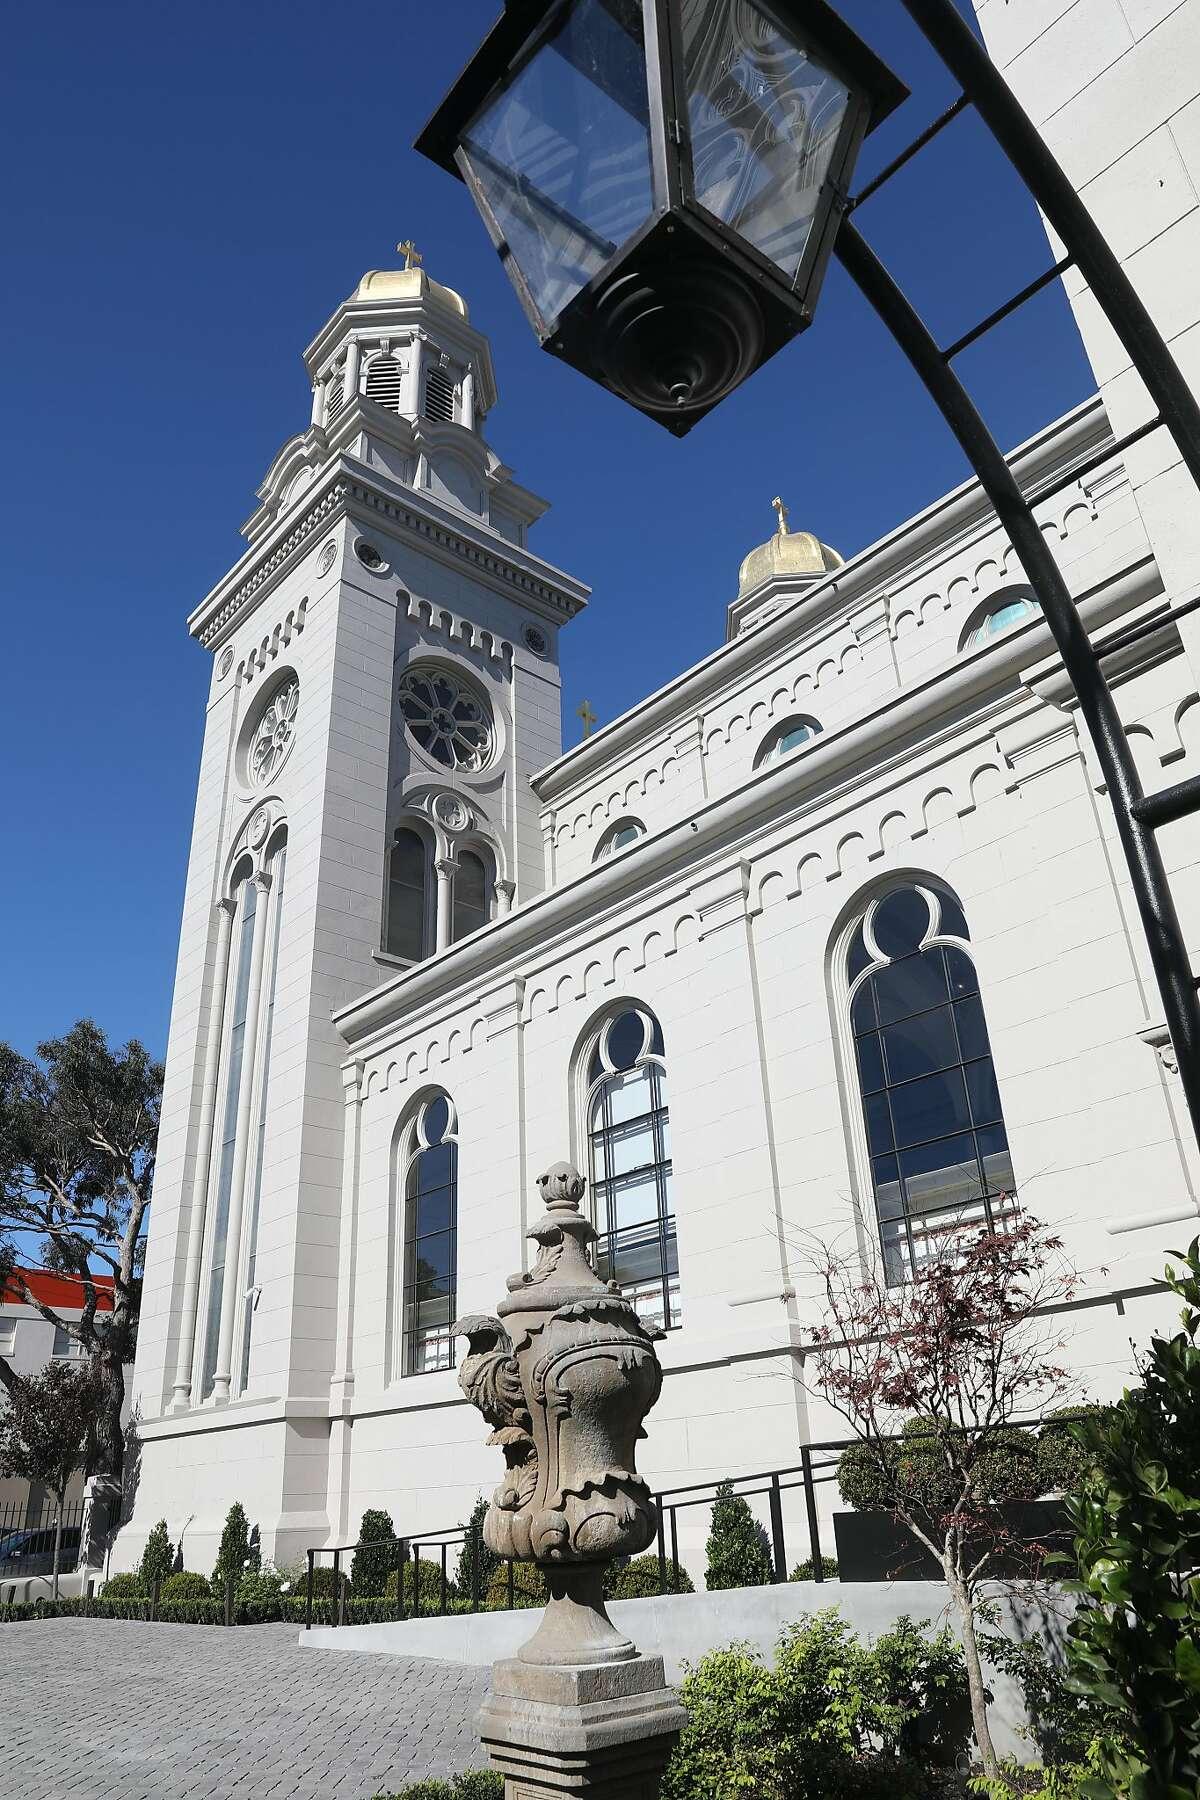 Saint Joseph's Arts Society seen from the garden area on Tuesday, Oct. 16, 2018, in San Francisco, Calif.